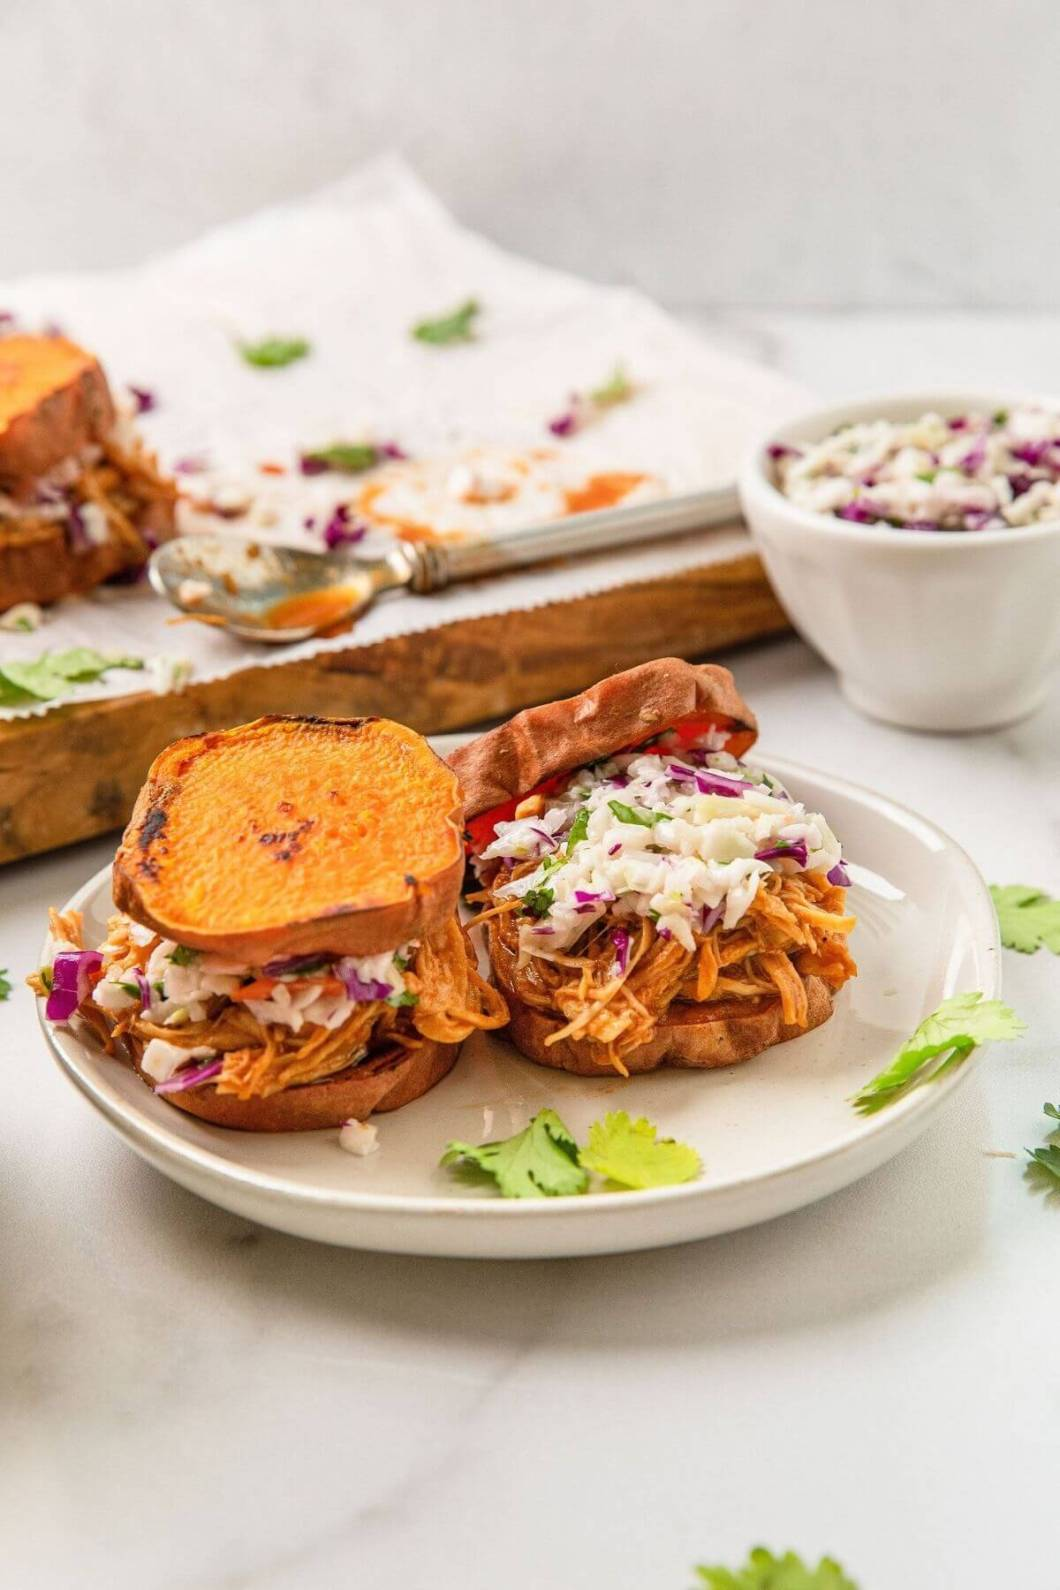 shredded BBQ chicken on sweet potato buns